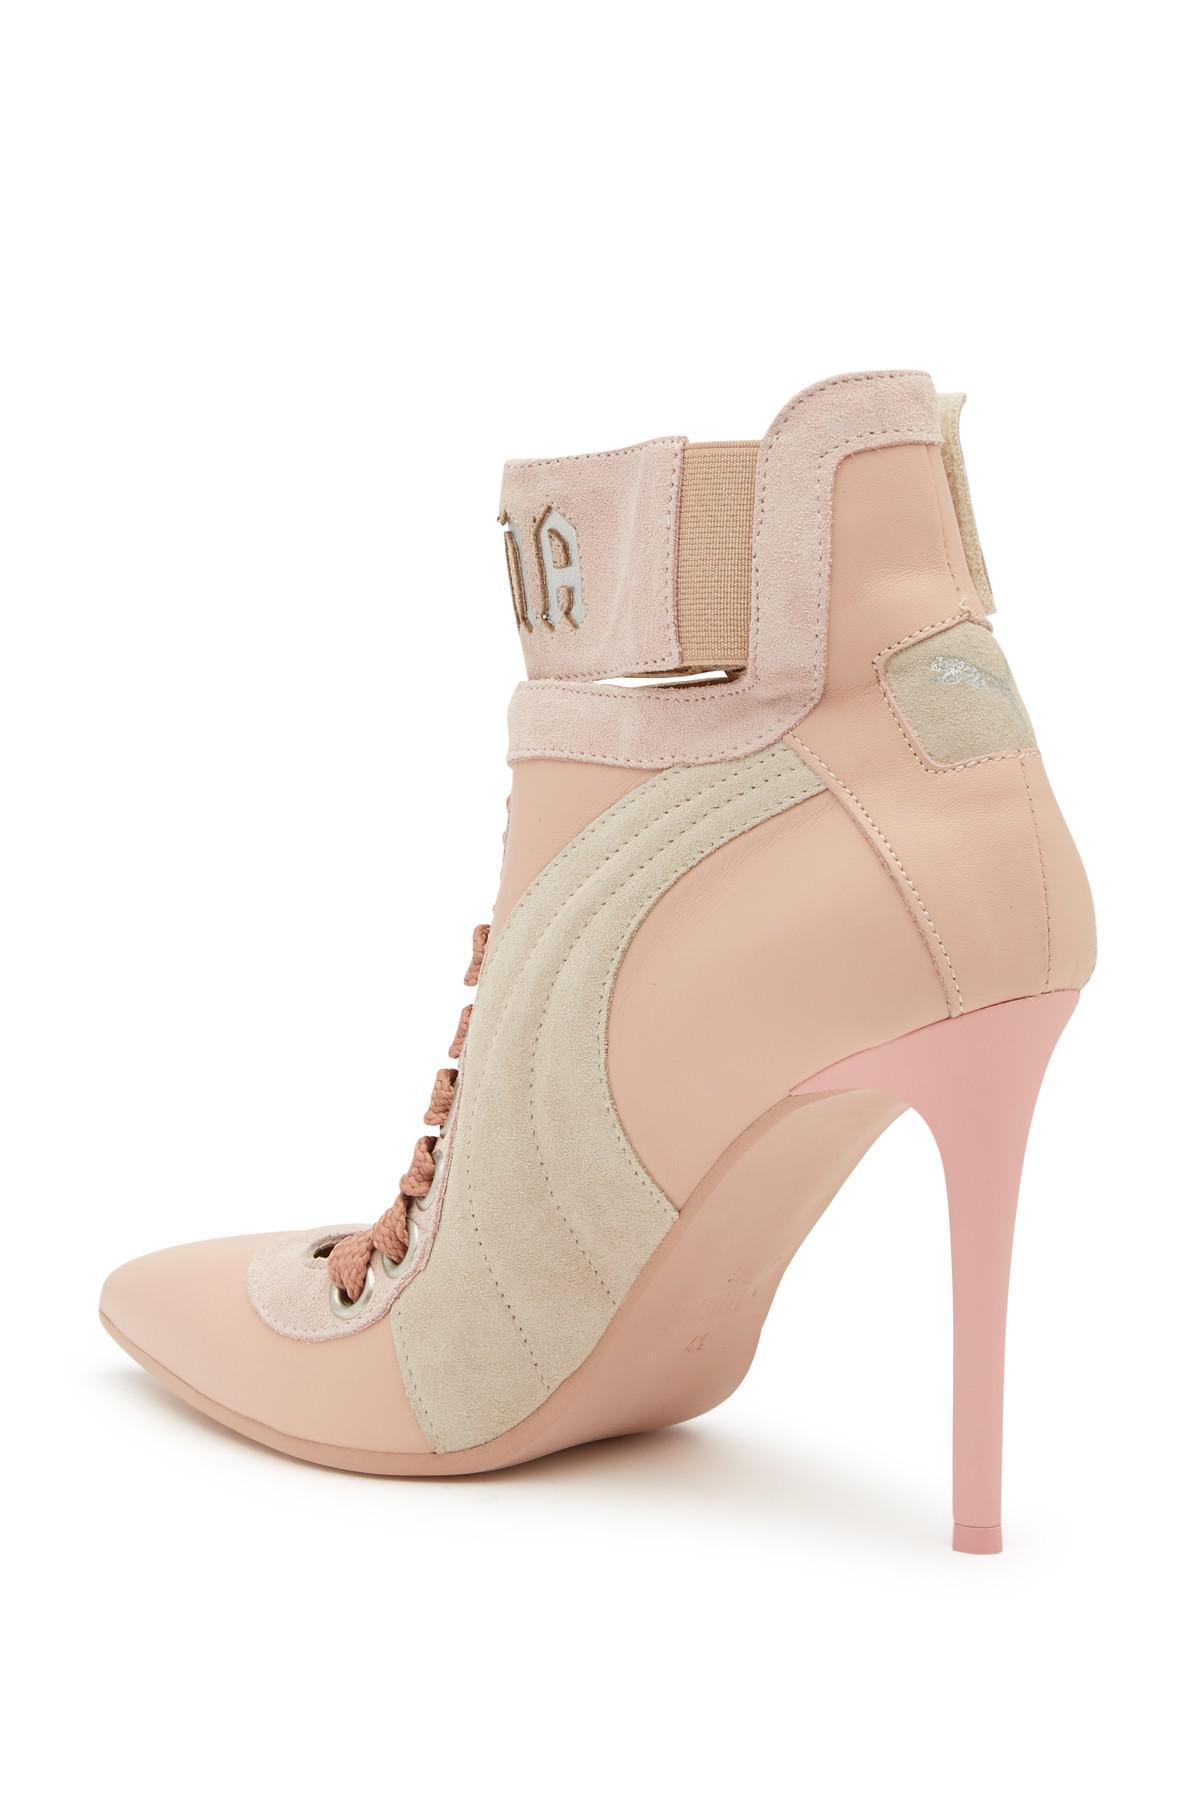 ef5bcee4e66e06 PUMA Puma By Rihanna Lace-up Pump in Pink - Lyst